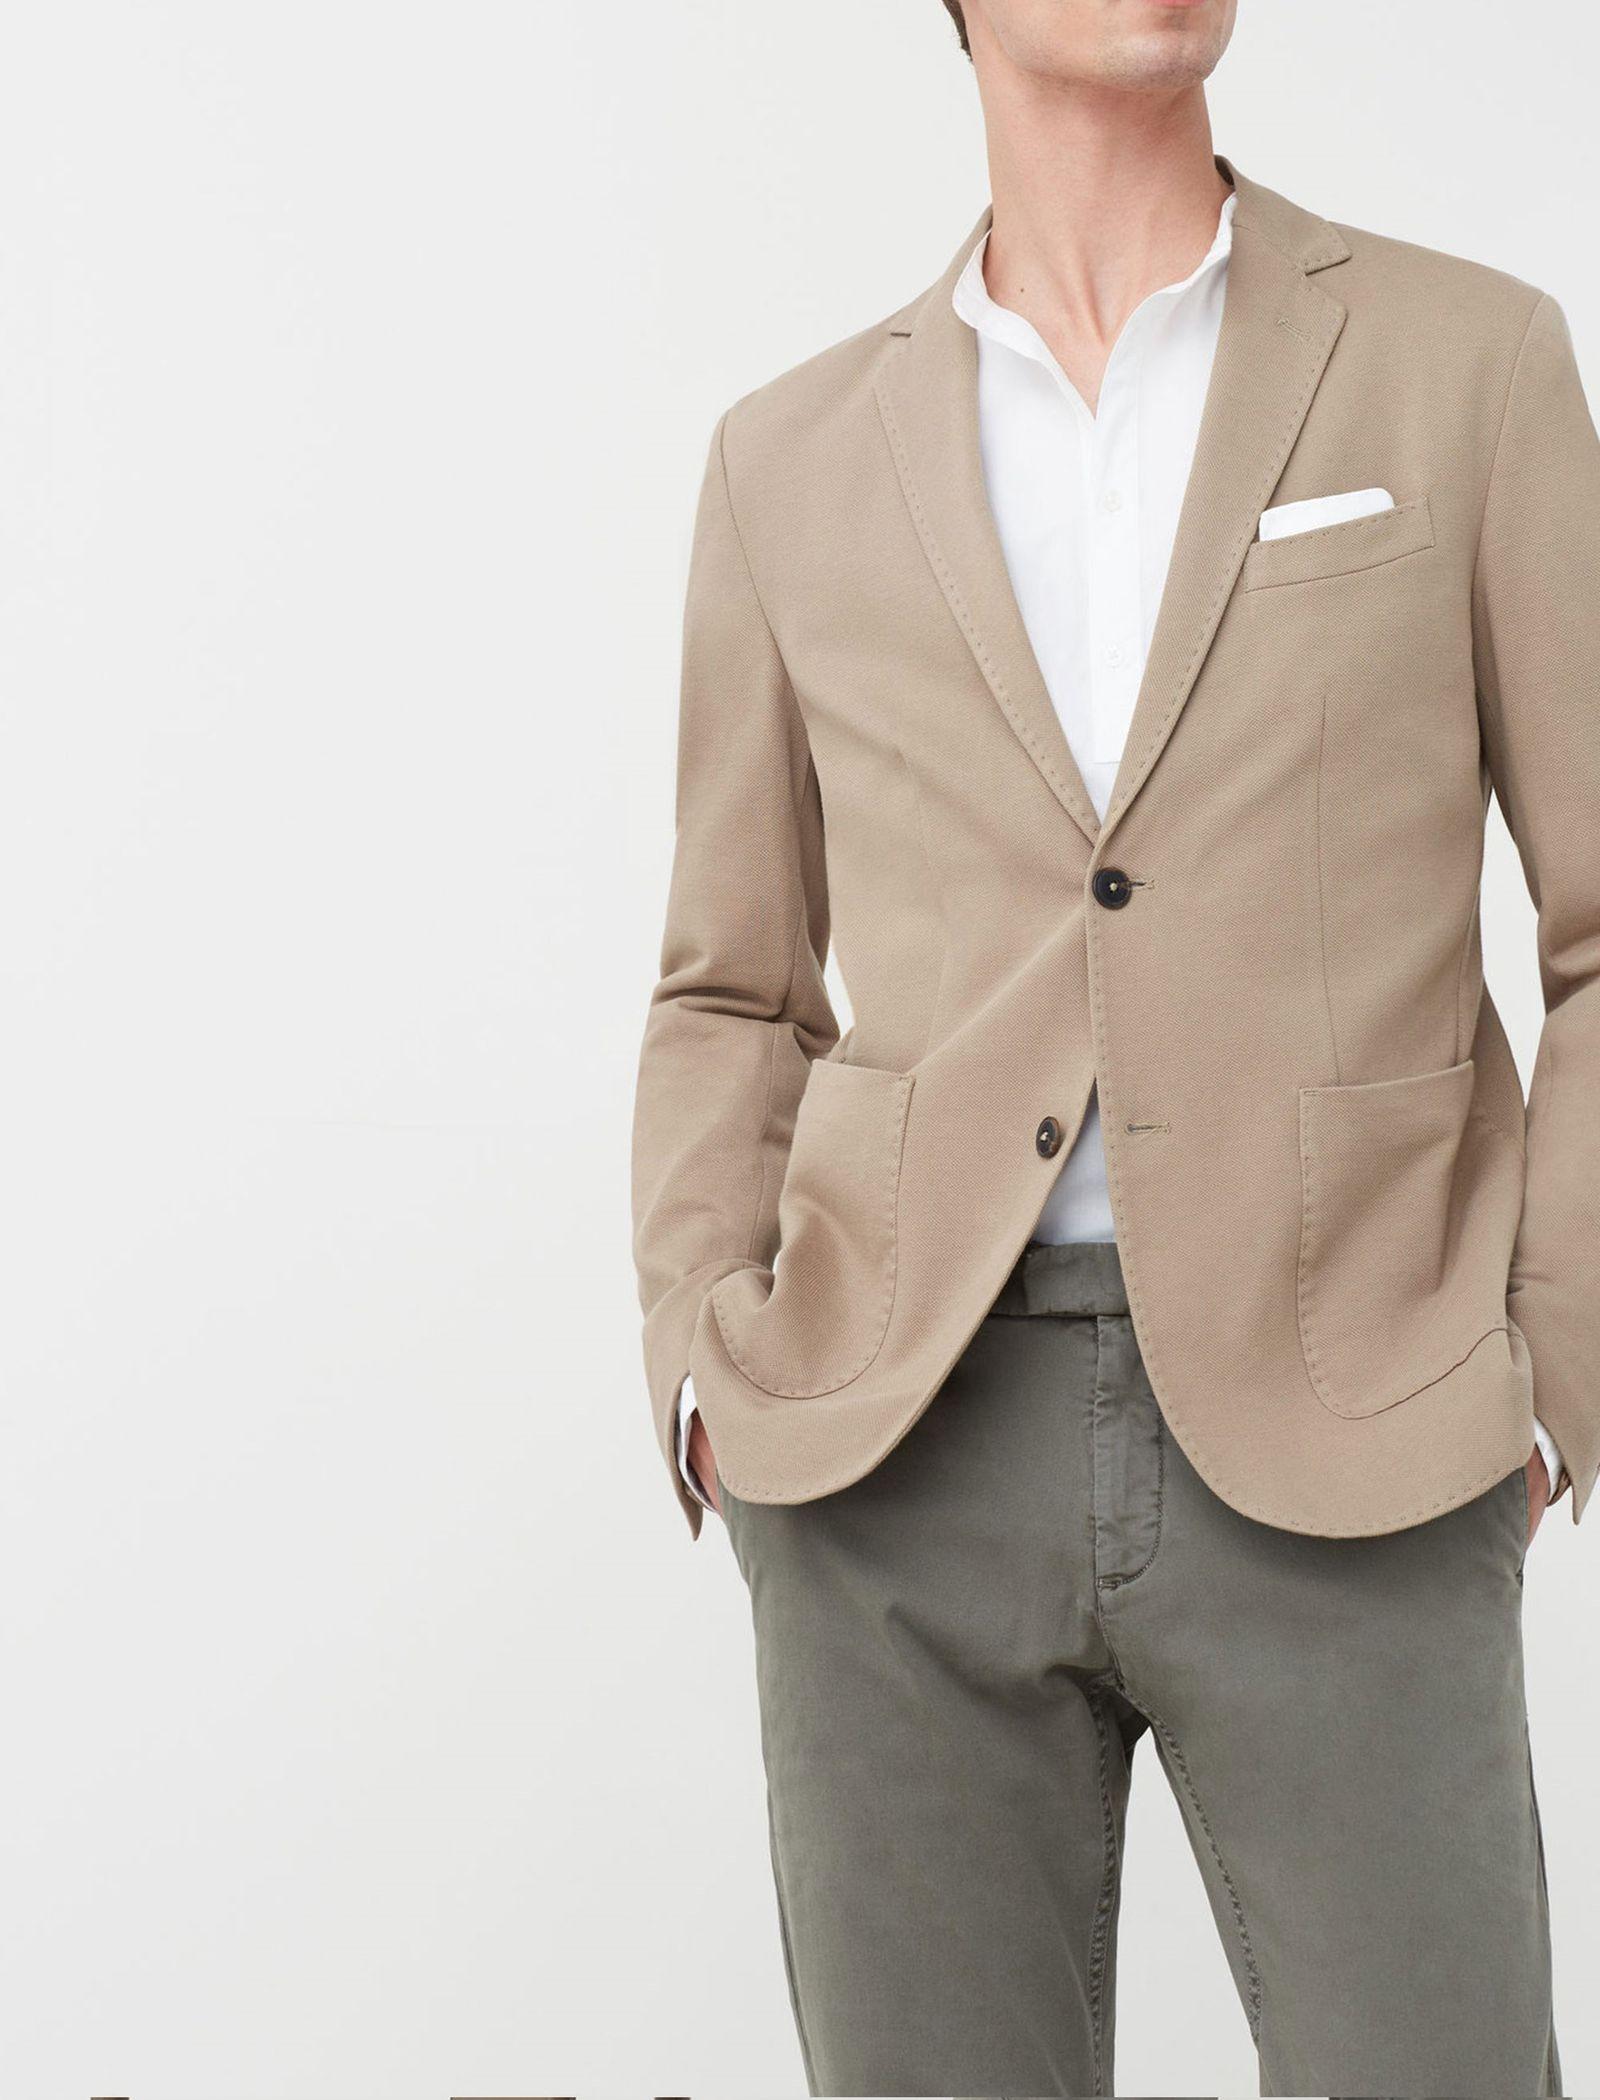 کت تک نخی مردانه - مانگو - بژ روشن - 5